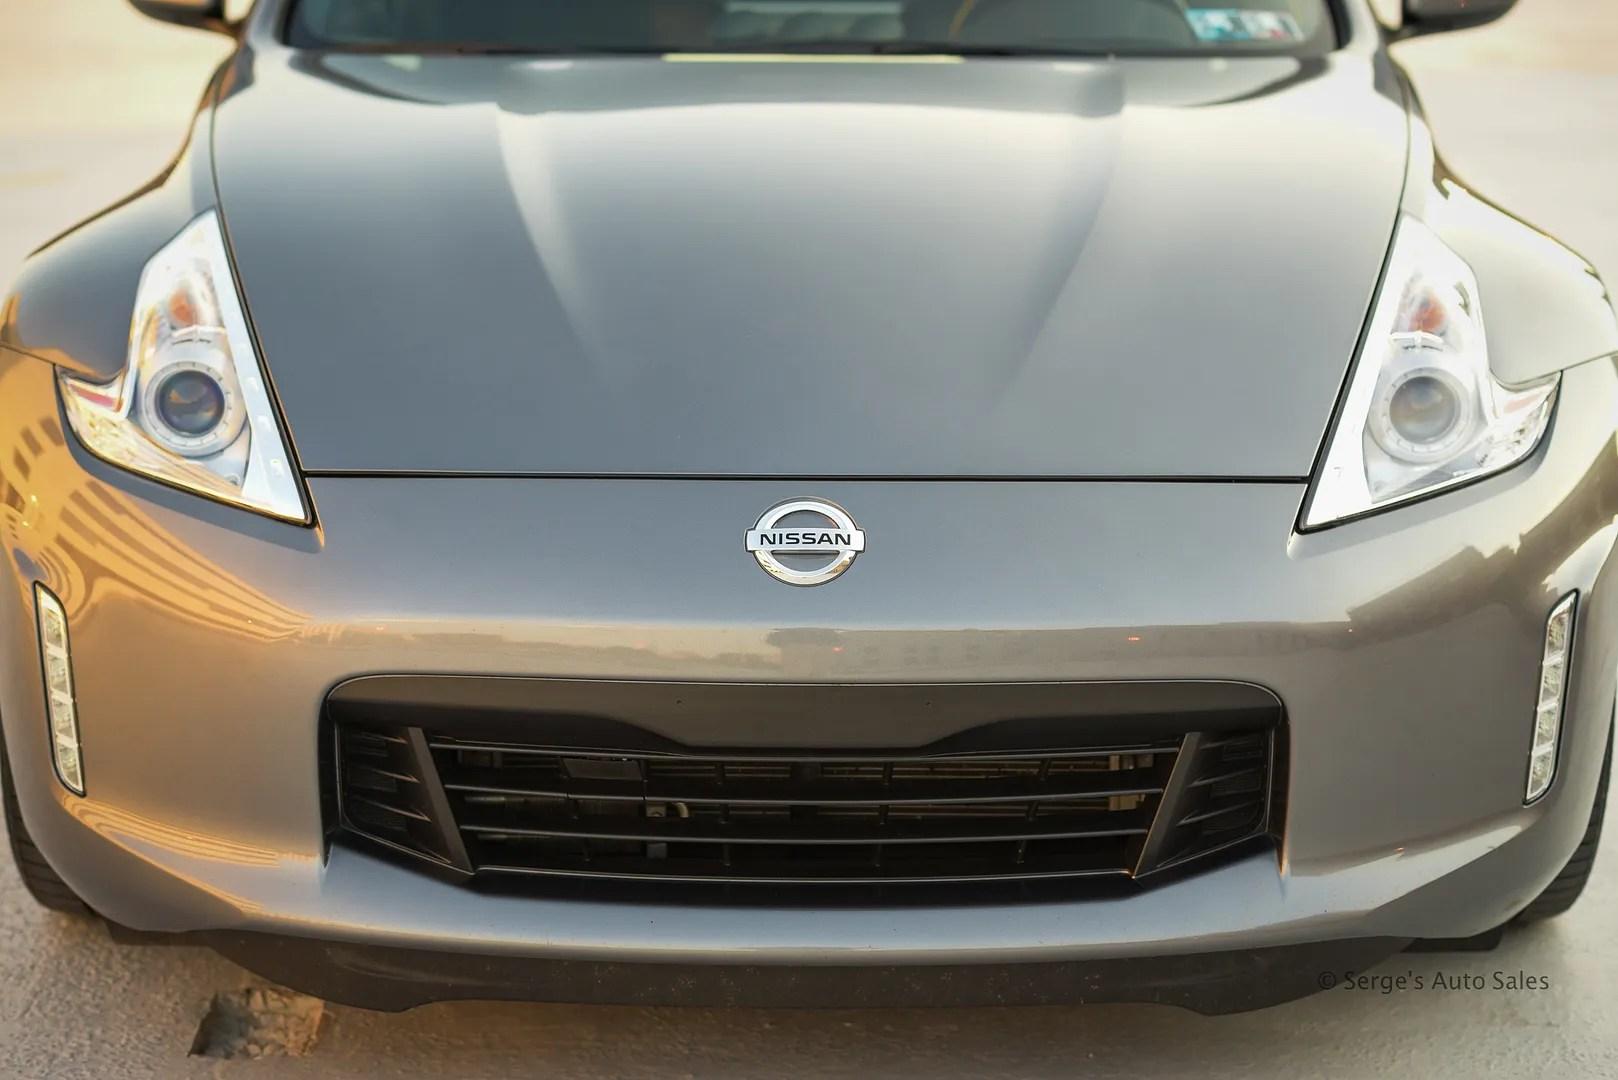 photo nissan-serges-auto-sales-northeast-pa-2014-370z--22_zps6axcyz5l.jpg